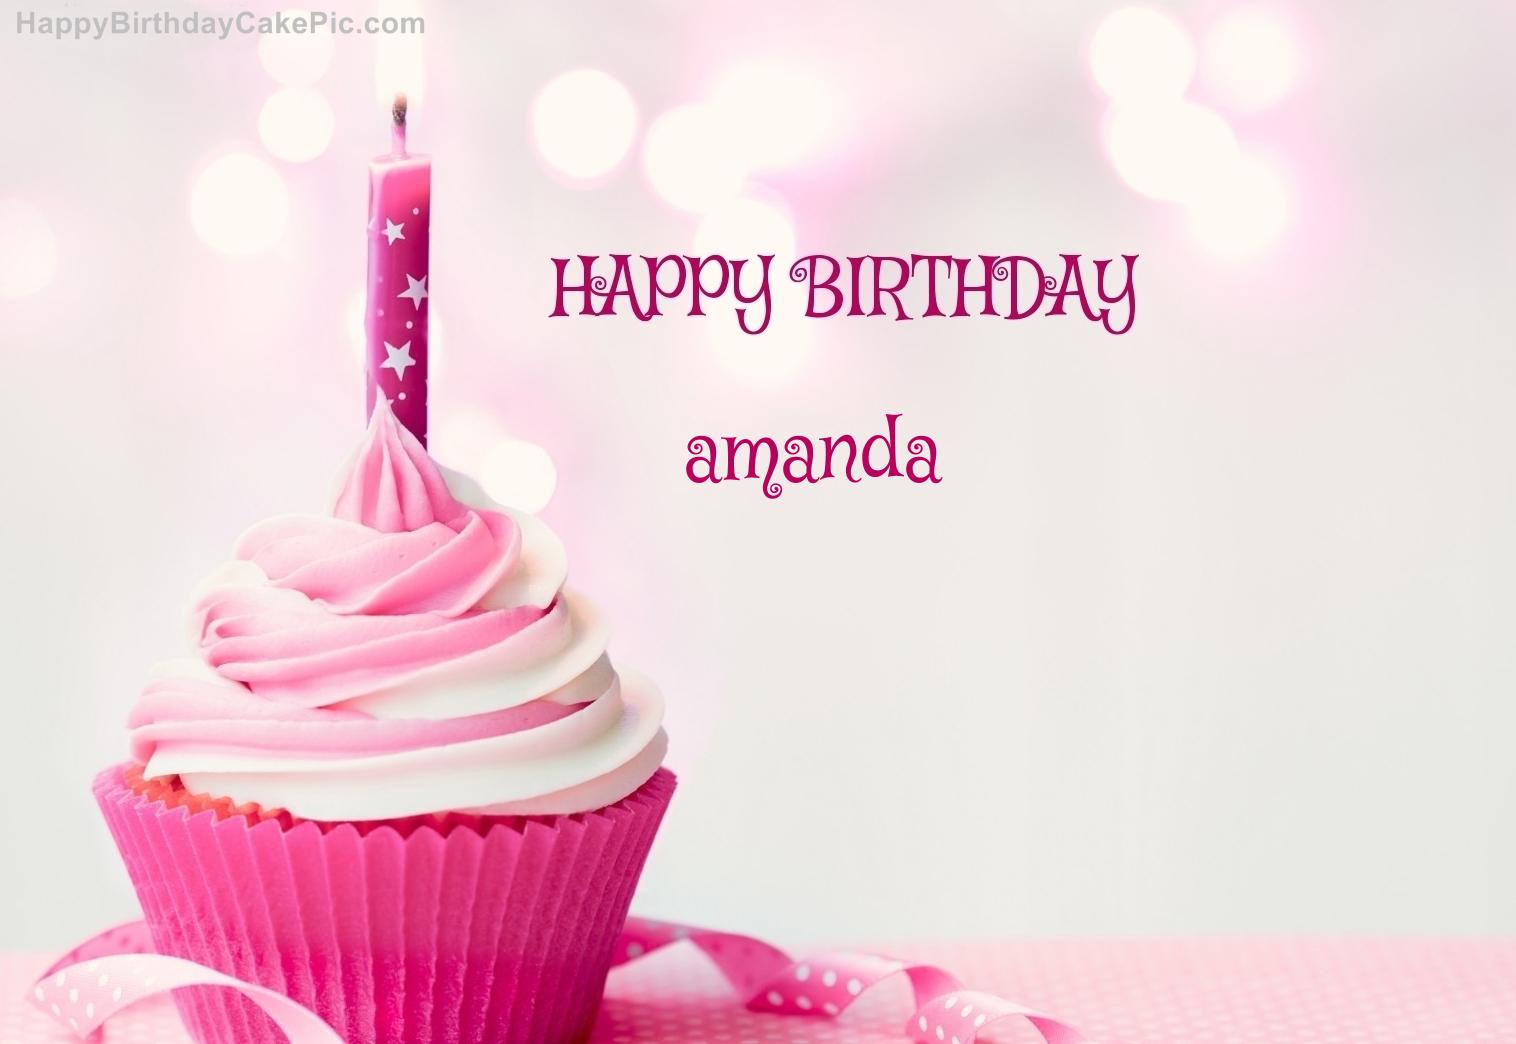 Happy Birthday Cupcake Candle Pink Cake For Amanda